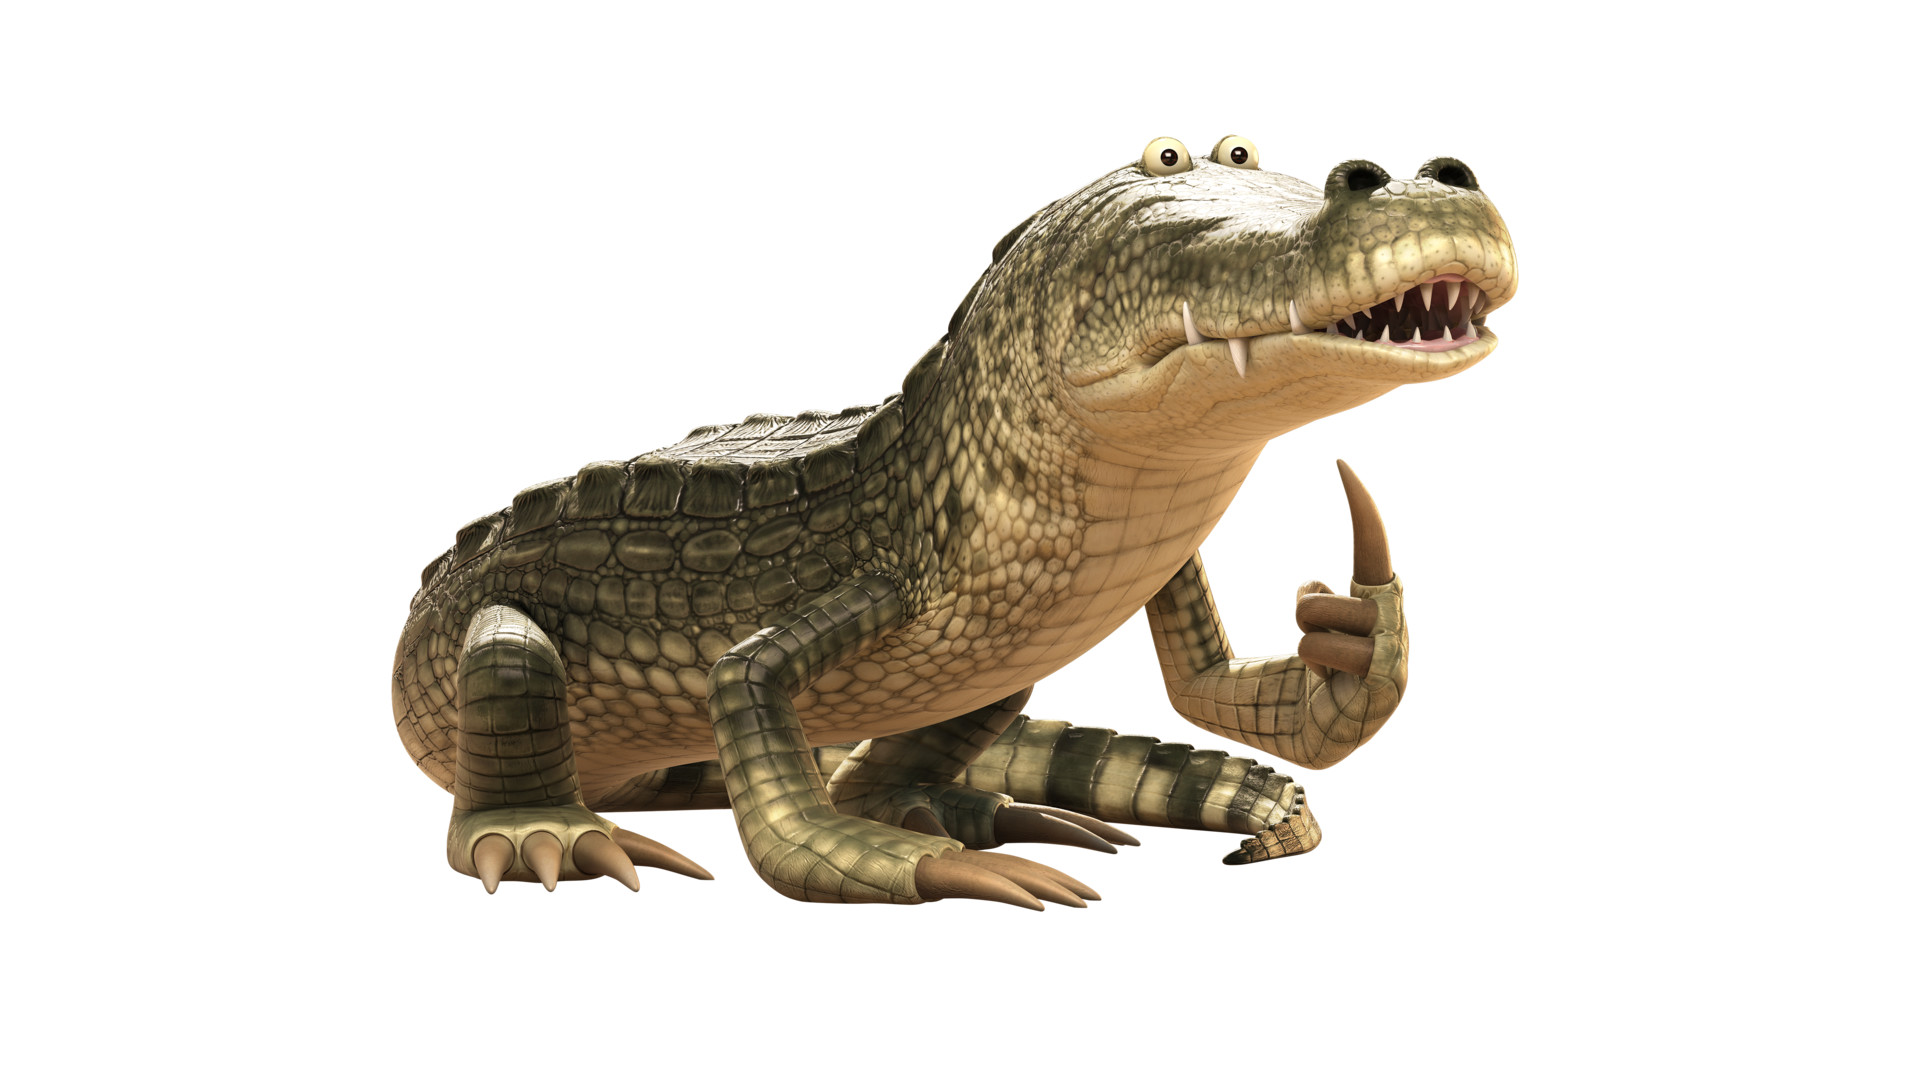 Duc phil nguyen crocodile attitude 04